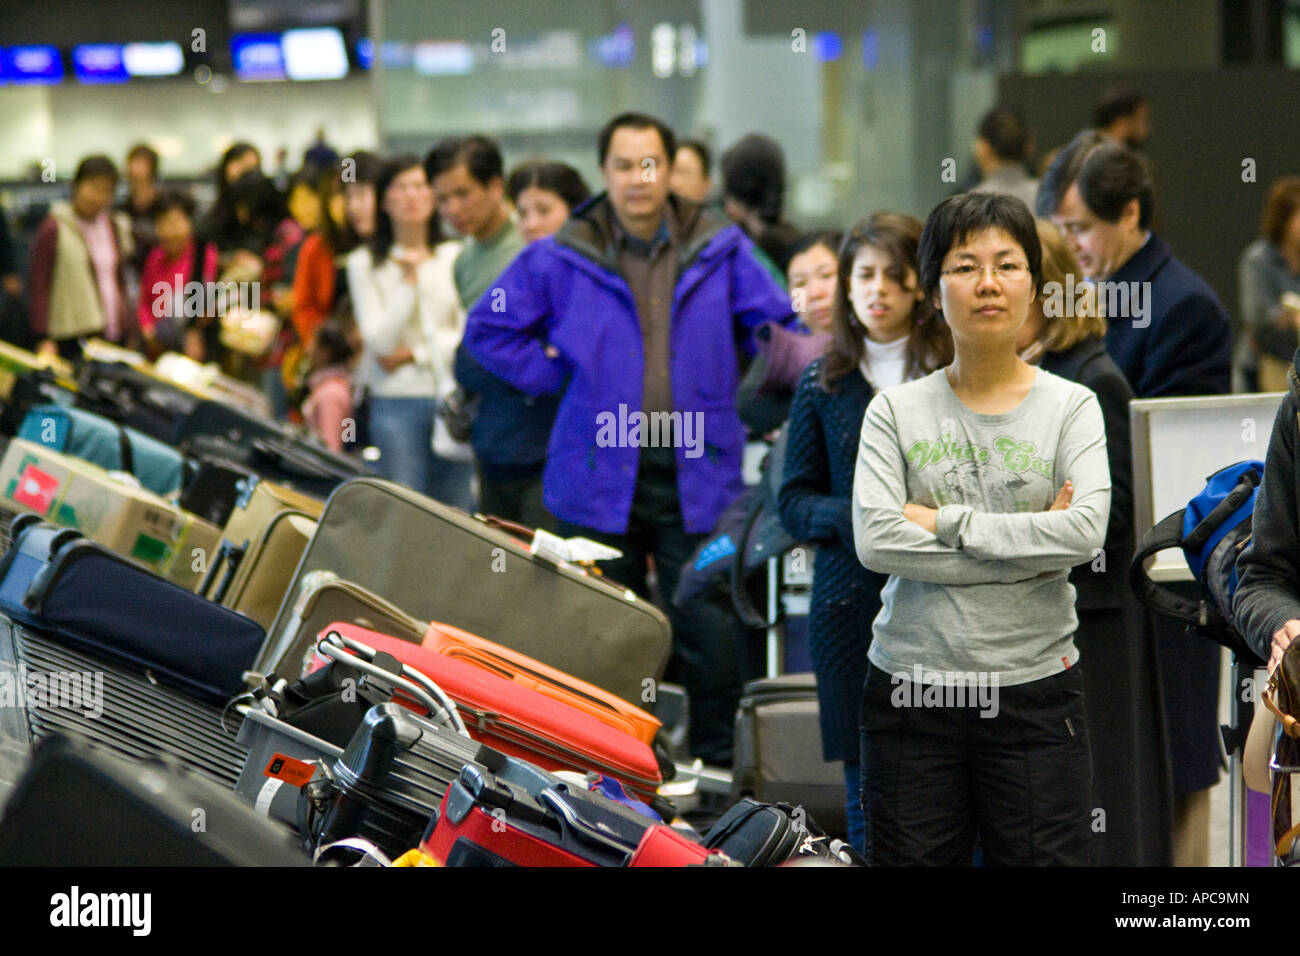 Baggage Claim Luggage Carrousel Hong Kong International